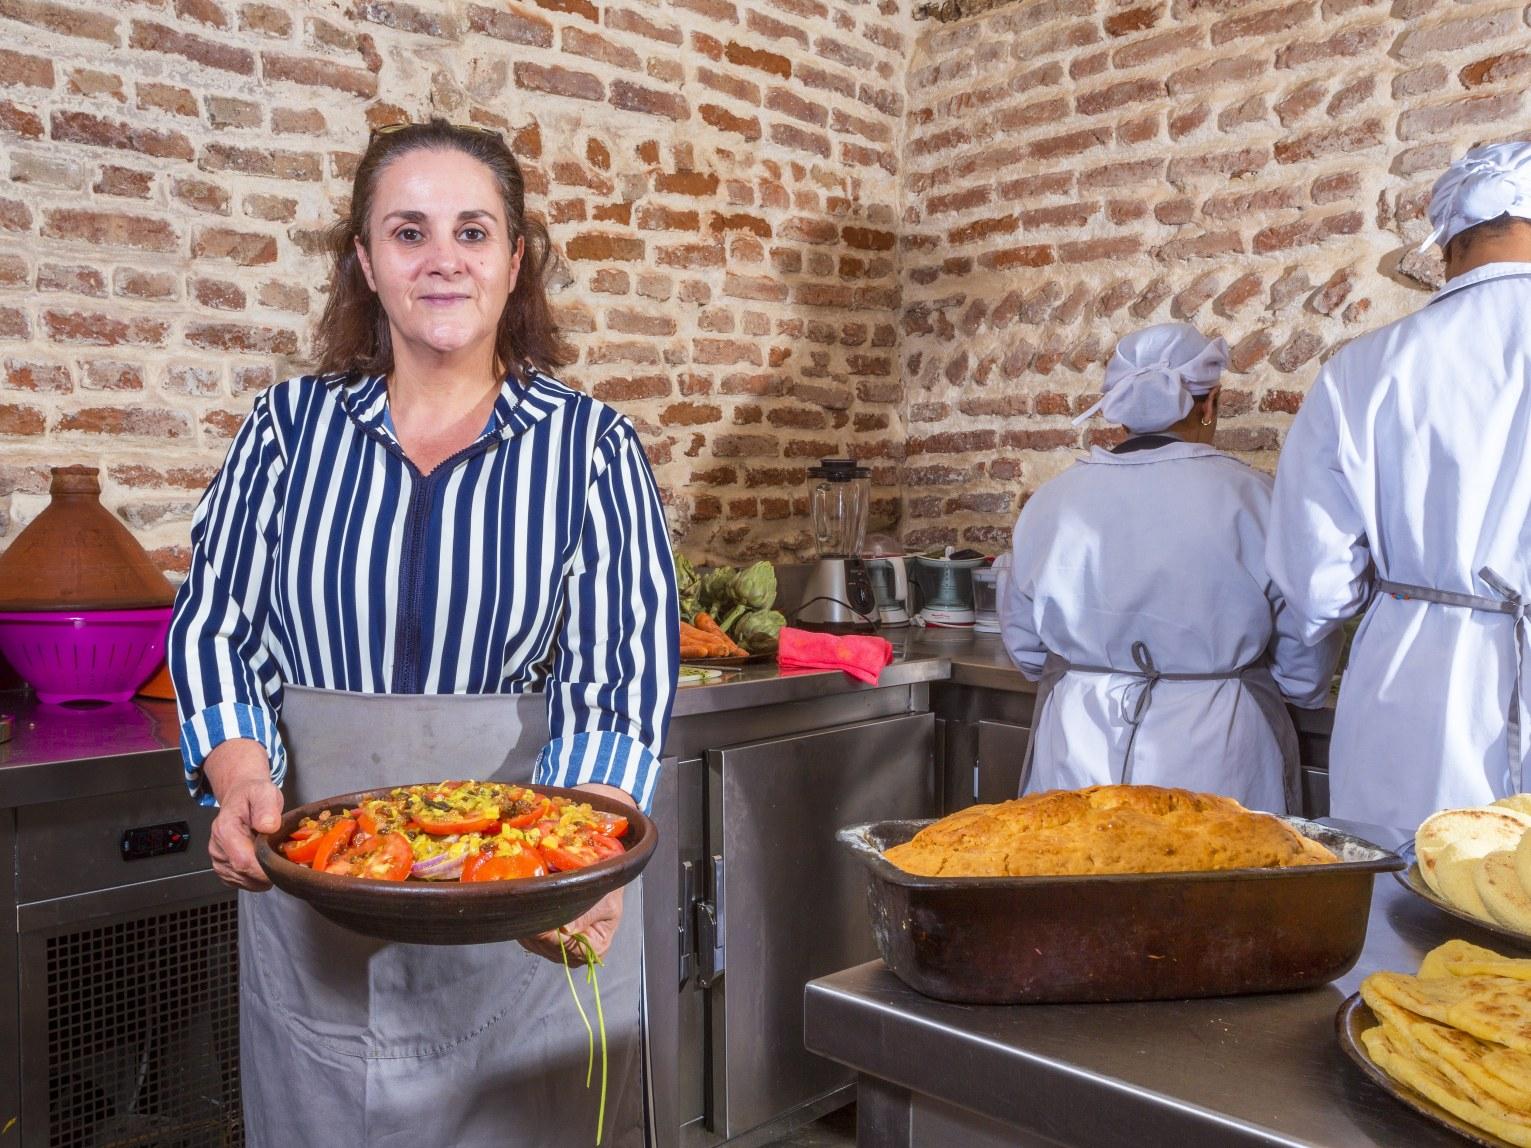 restaurant-marocain-marrakech-tajine-viande-tomate-huile-plat-cuisin-marocaine